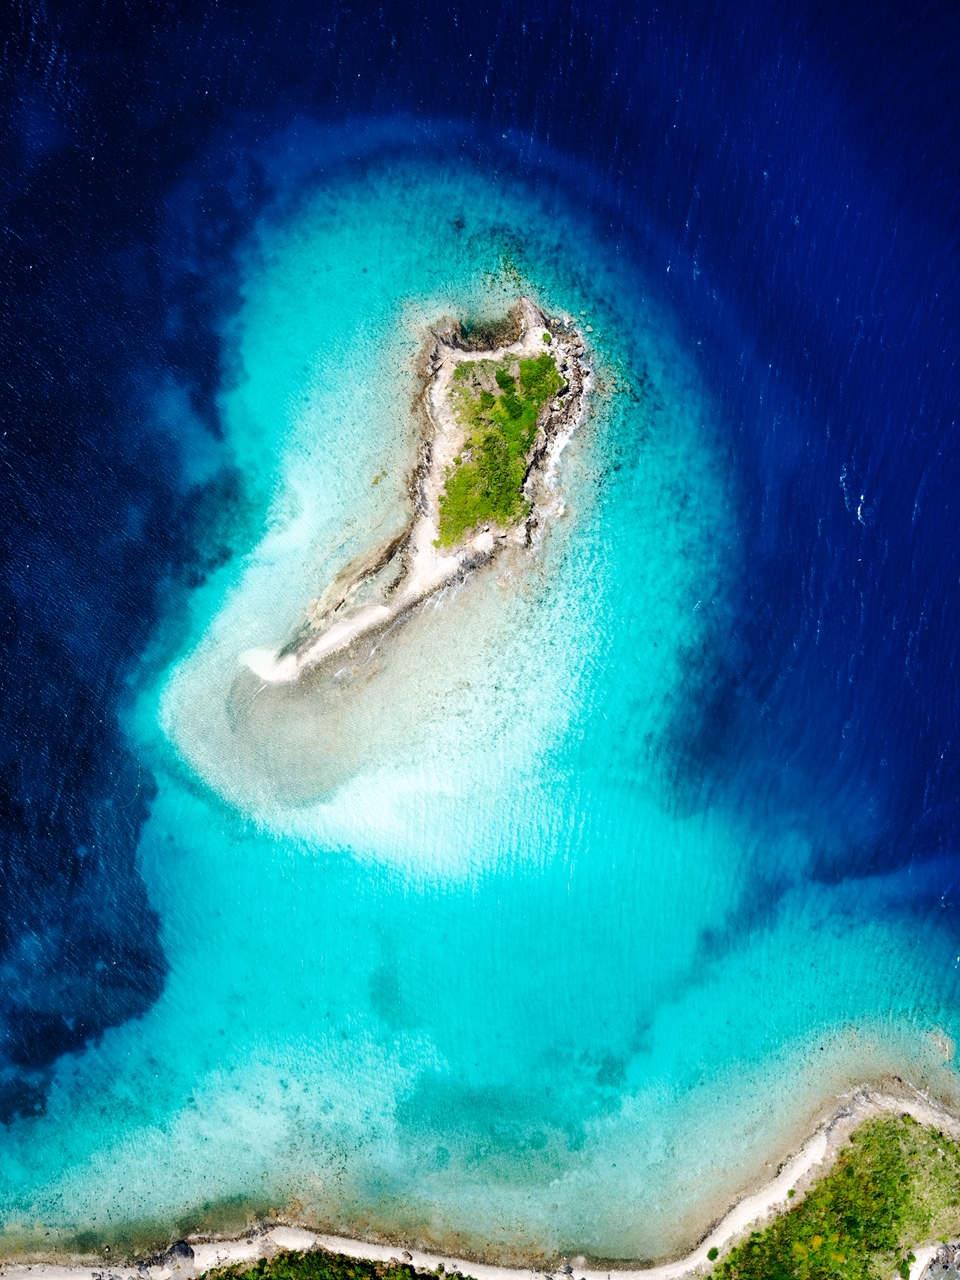 'Halo', Jost Van Dyke, British Virgin Islands